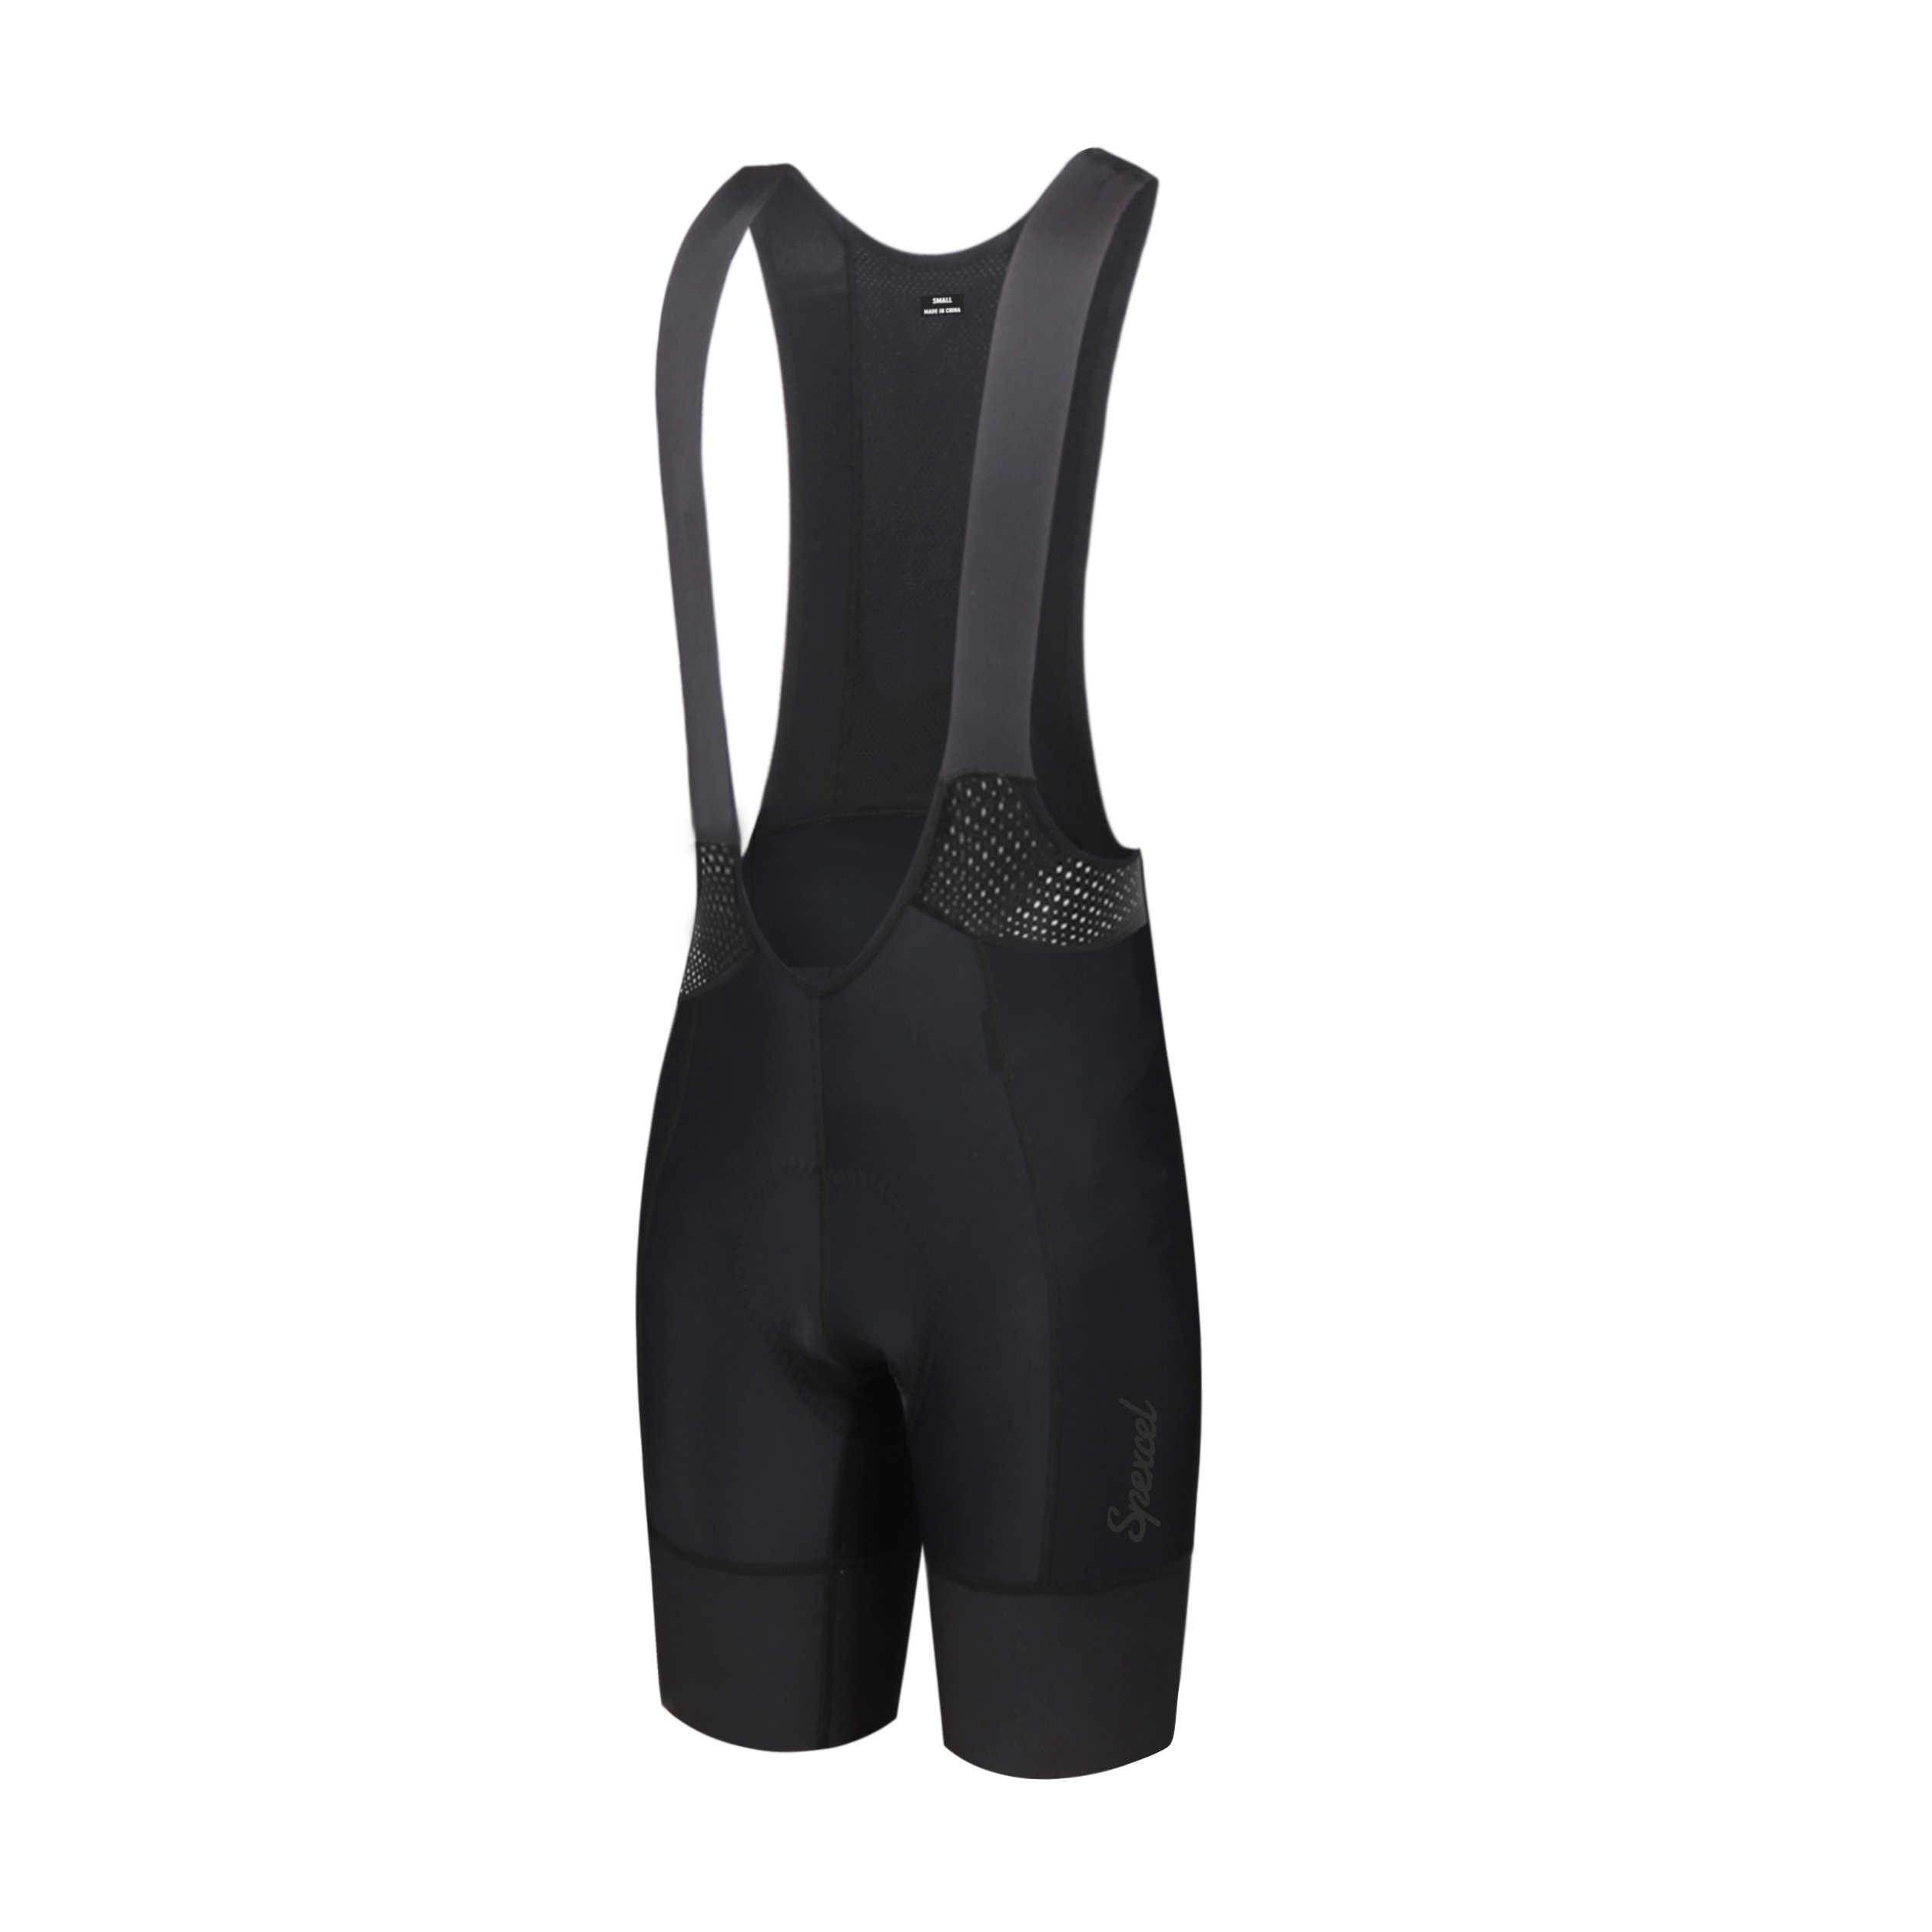 YKYWBIKE new men bib shorts Cycling Clothing Strap bib shorts Bicycle shorts